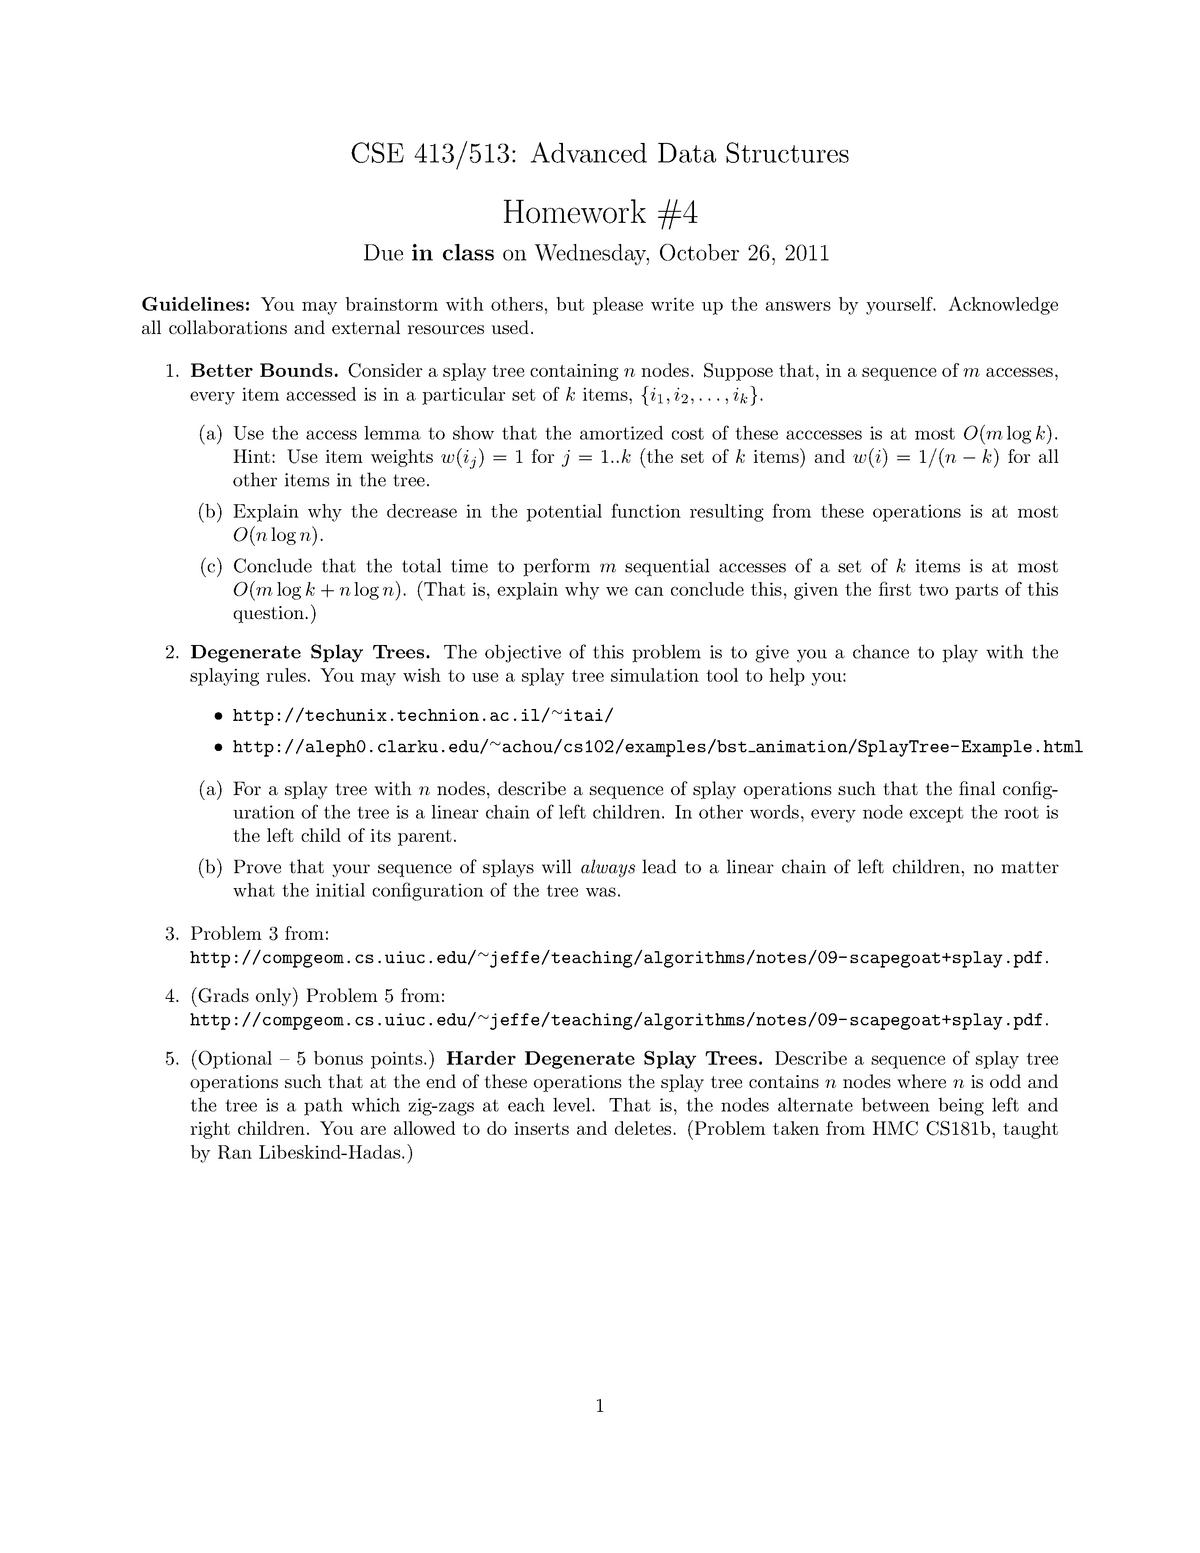 Hw4 - Homework assignment 4 - CIS 413 - University of Oregon